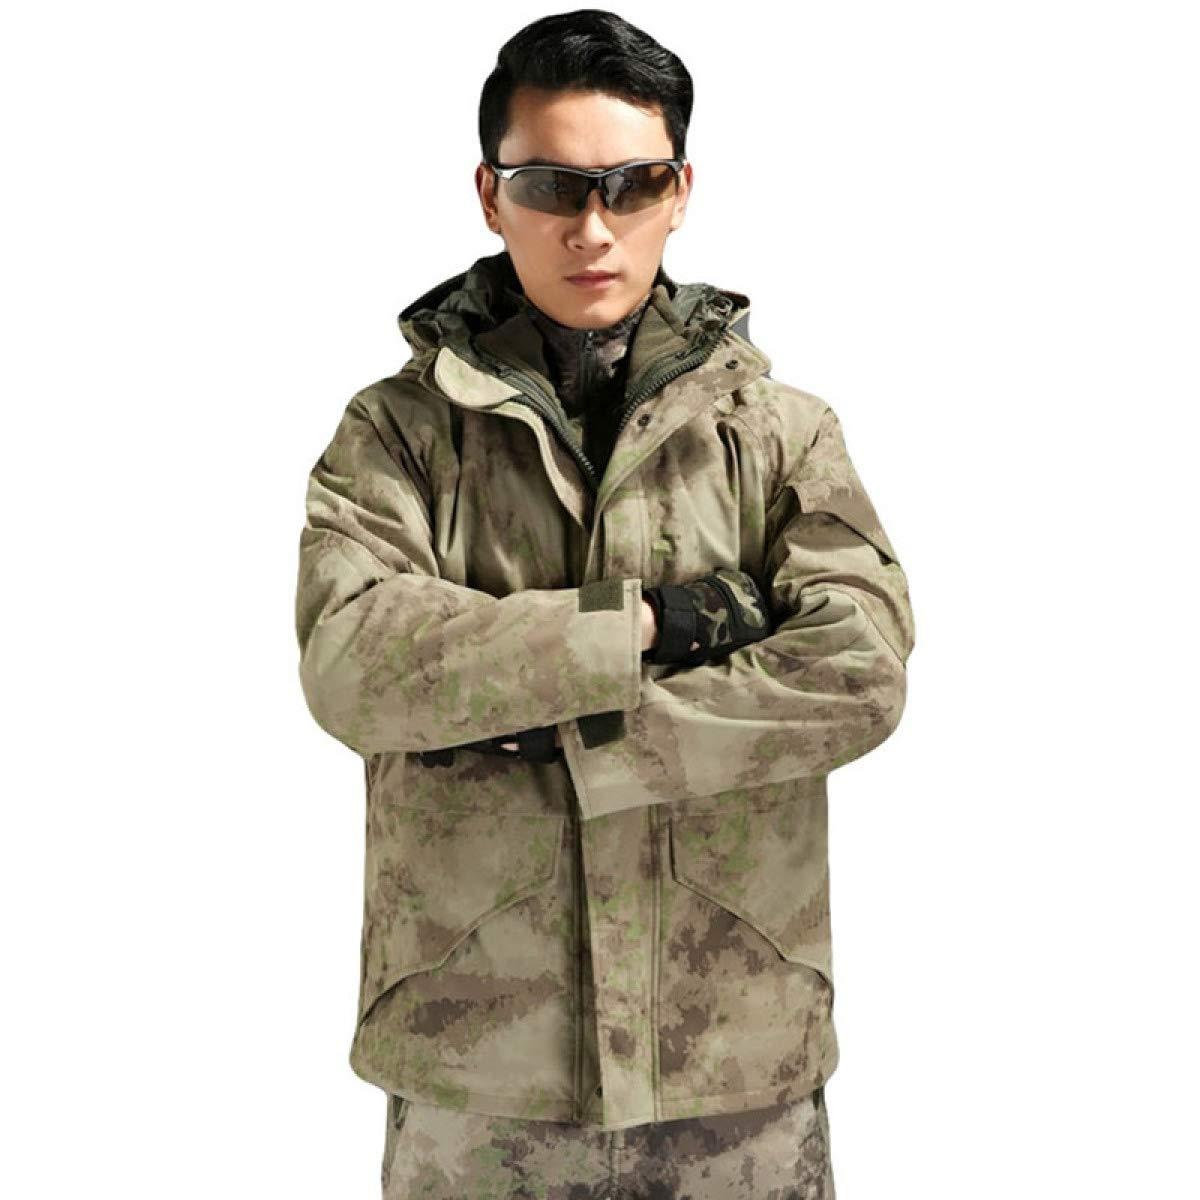 Amazon.com: Chaqueta de camuflaje táctica militar ...